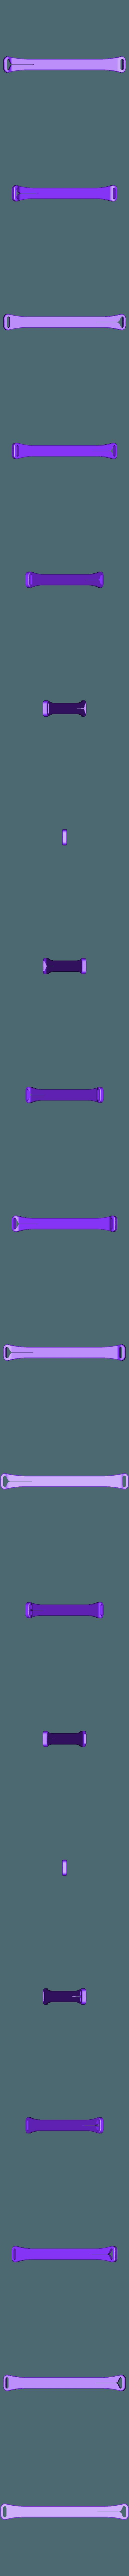 Keychain_Strap_v1-3_80mm.STL Download free STL file Keyring Strap • 3D printable model, WalterHsiao